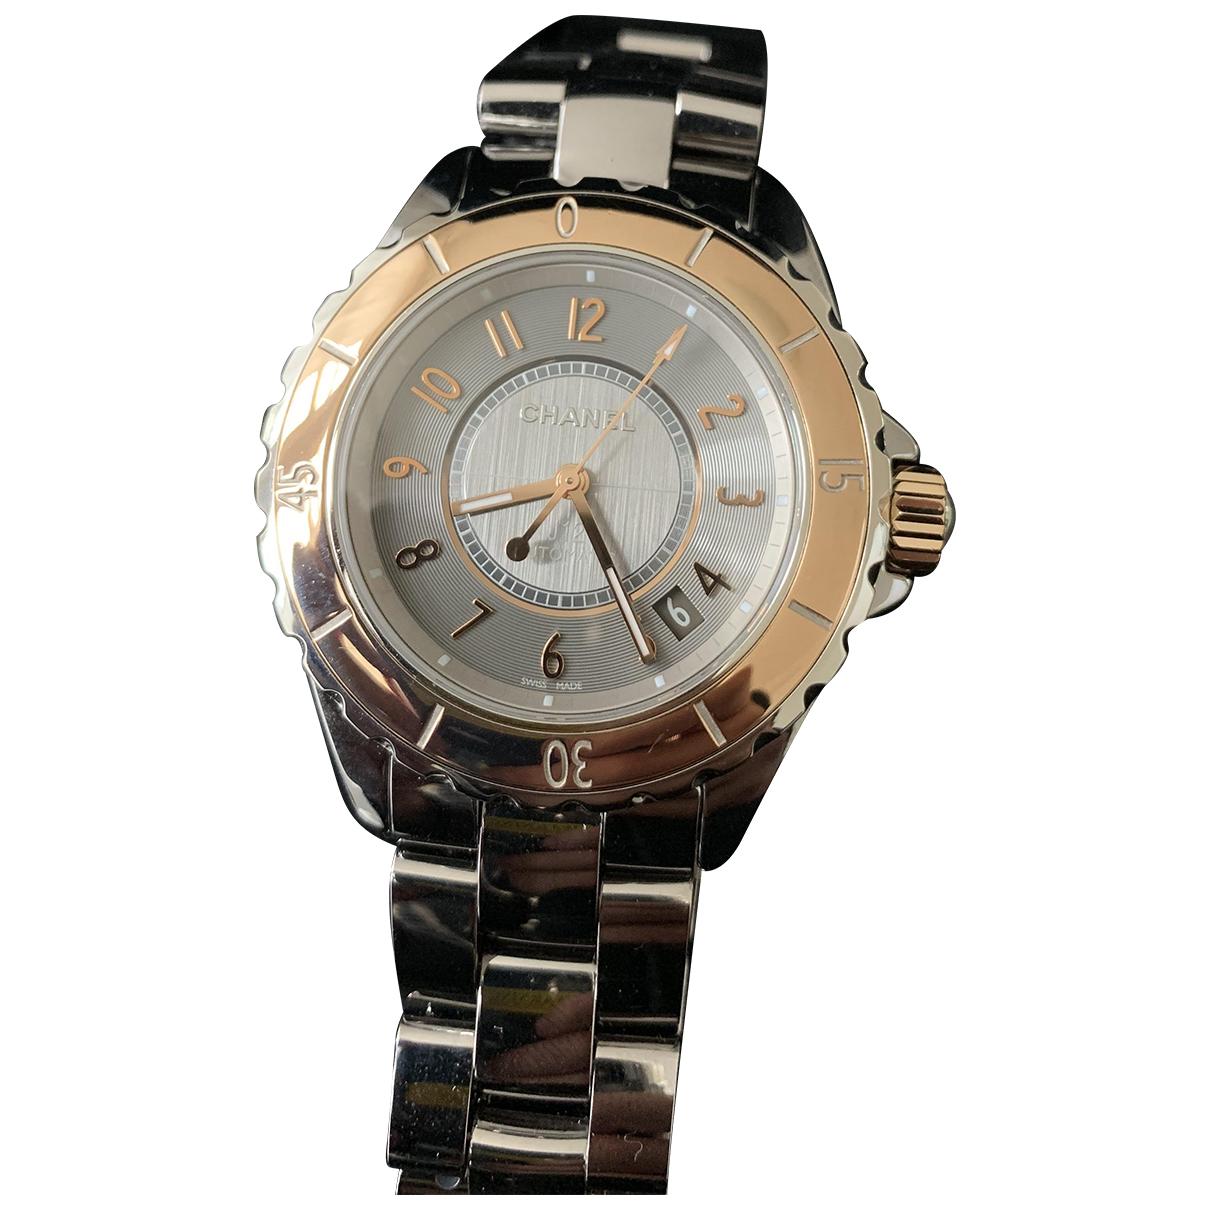 Chanel J12 Automatique Uhr in Keramik